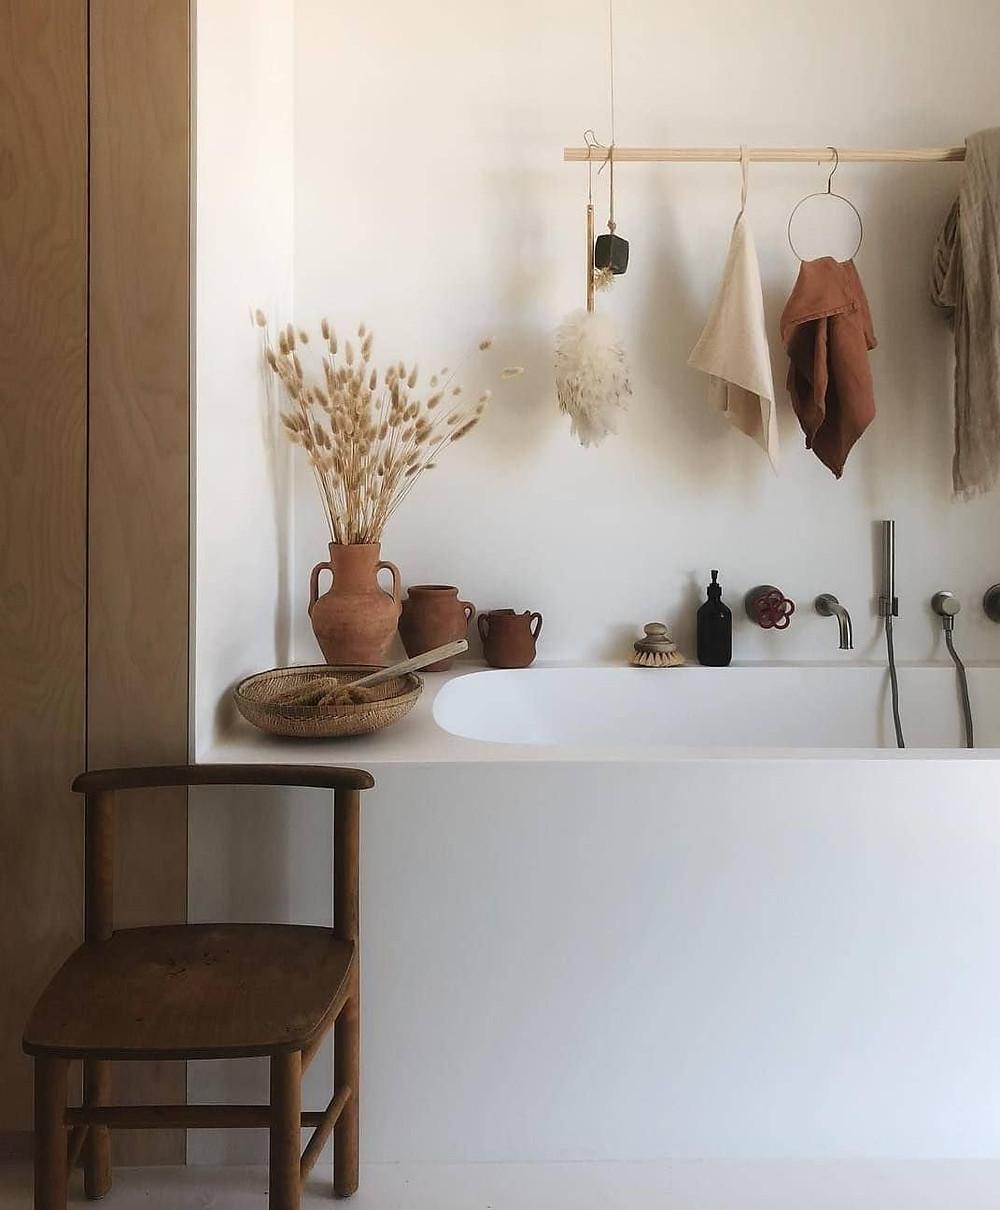 Spa bathroom accessorise